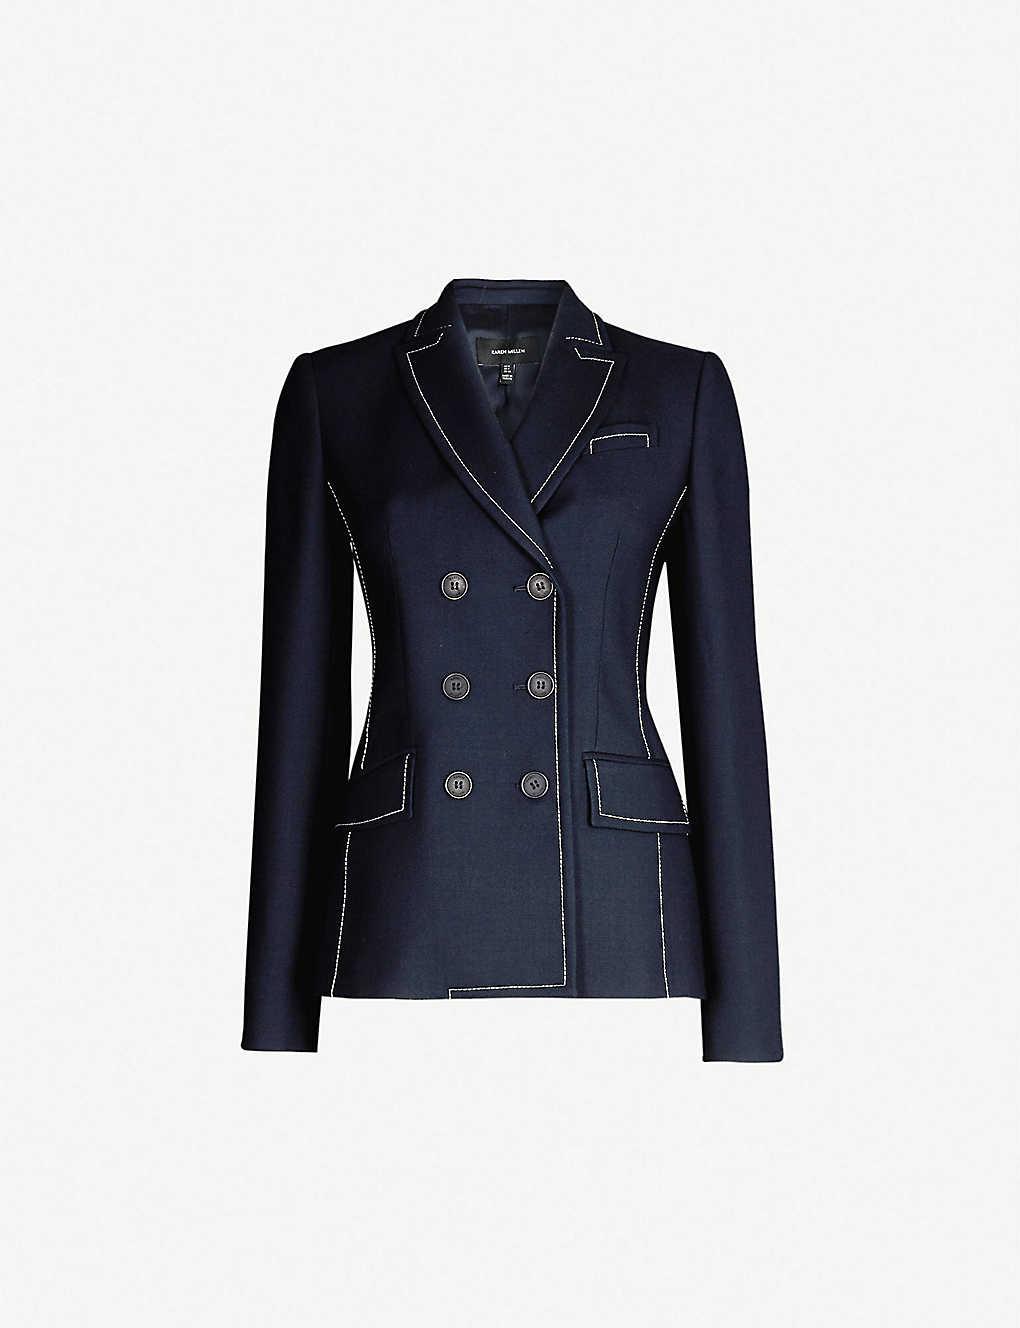 8a935f1c74 KAREN MILLEN - Bianca double-breasted woven jacket   Selfridges.com